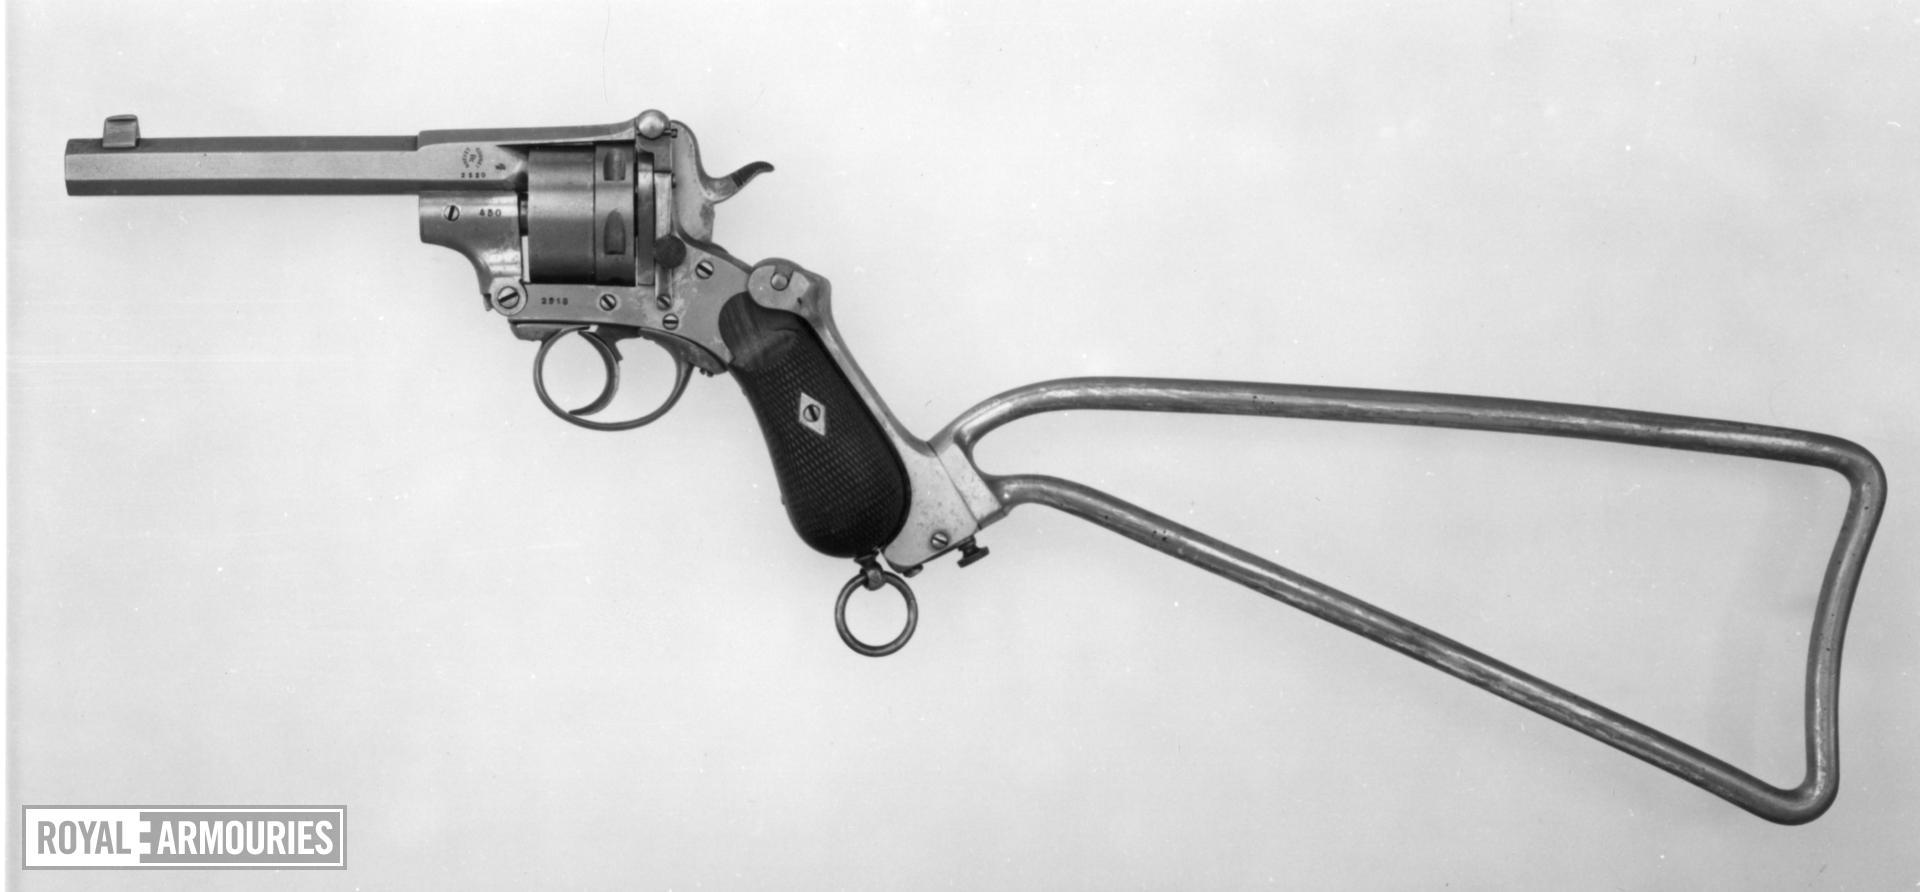 Centrefire five-shot revolver